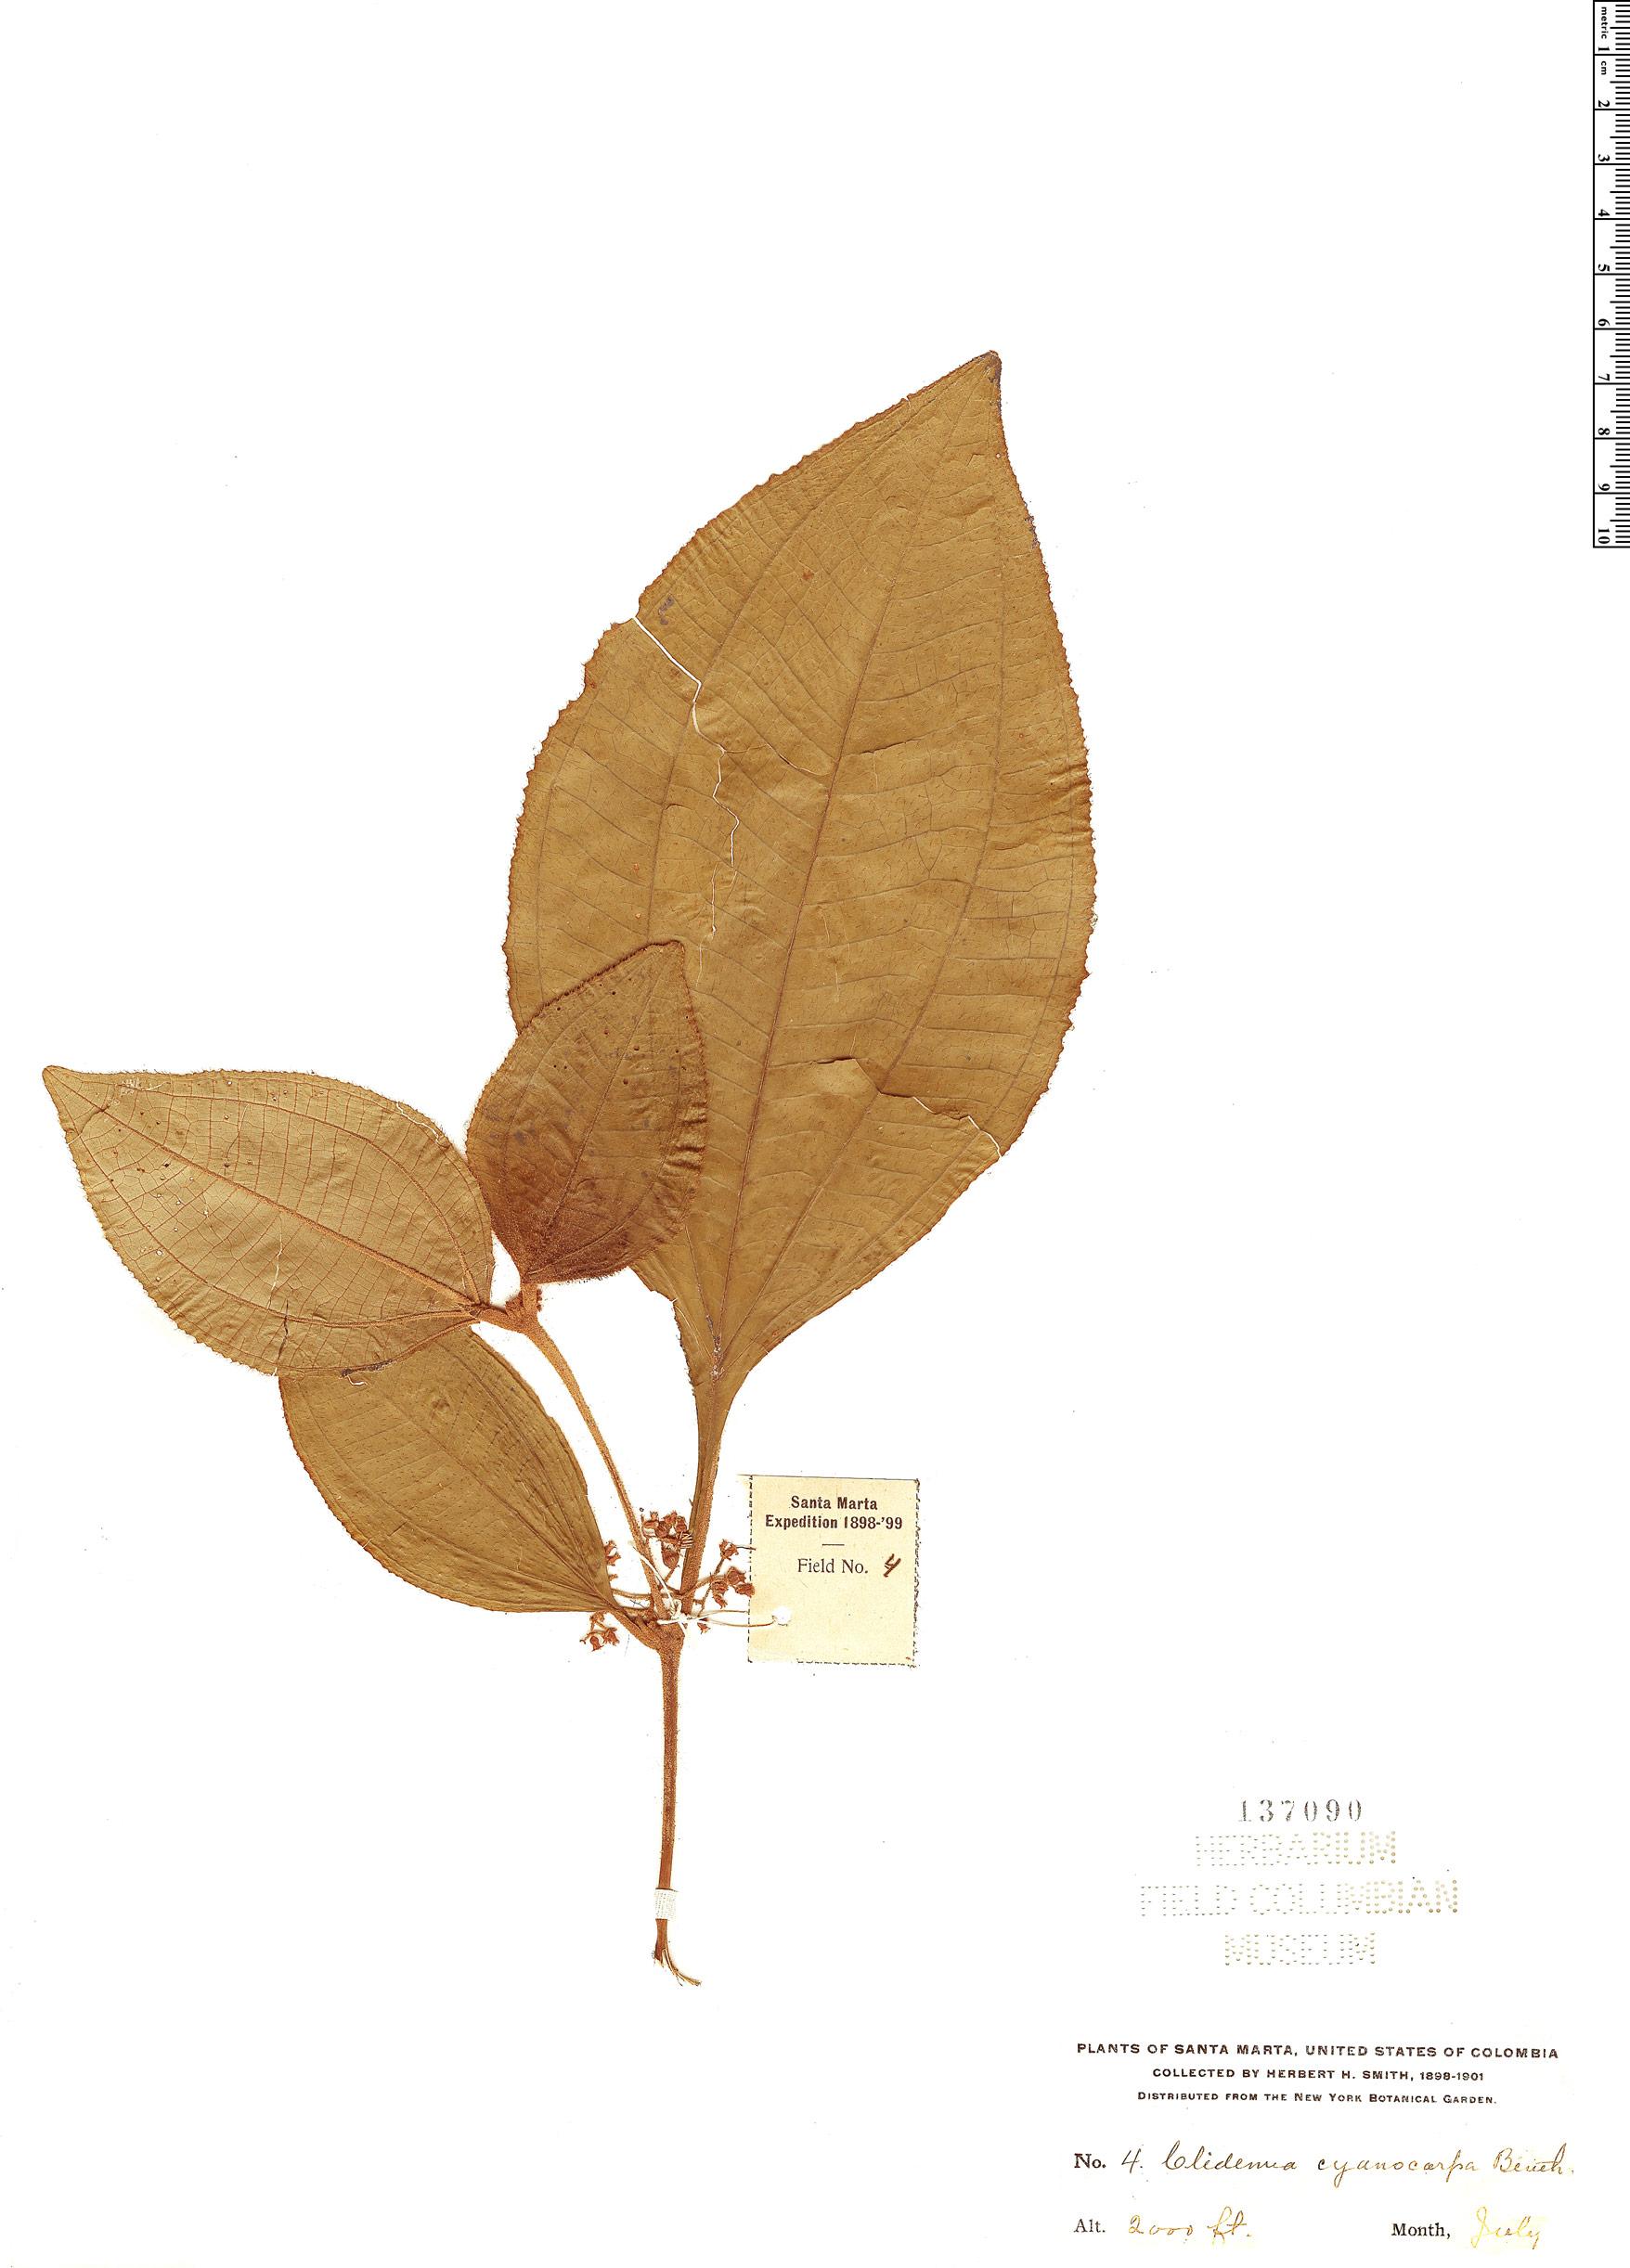 Espécime: Clidemia cyanocarpa